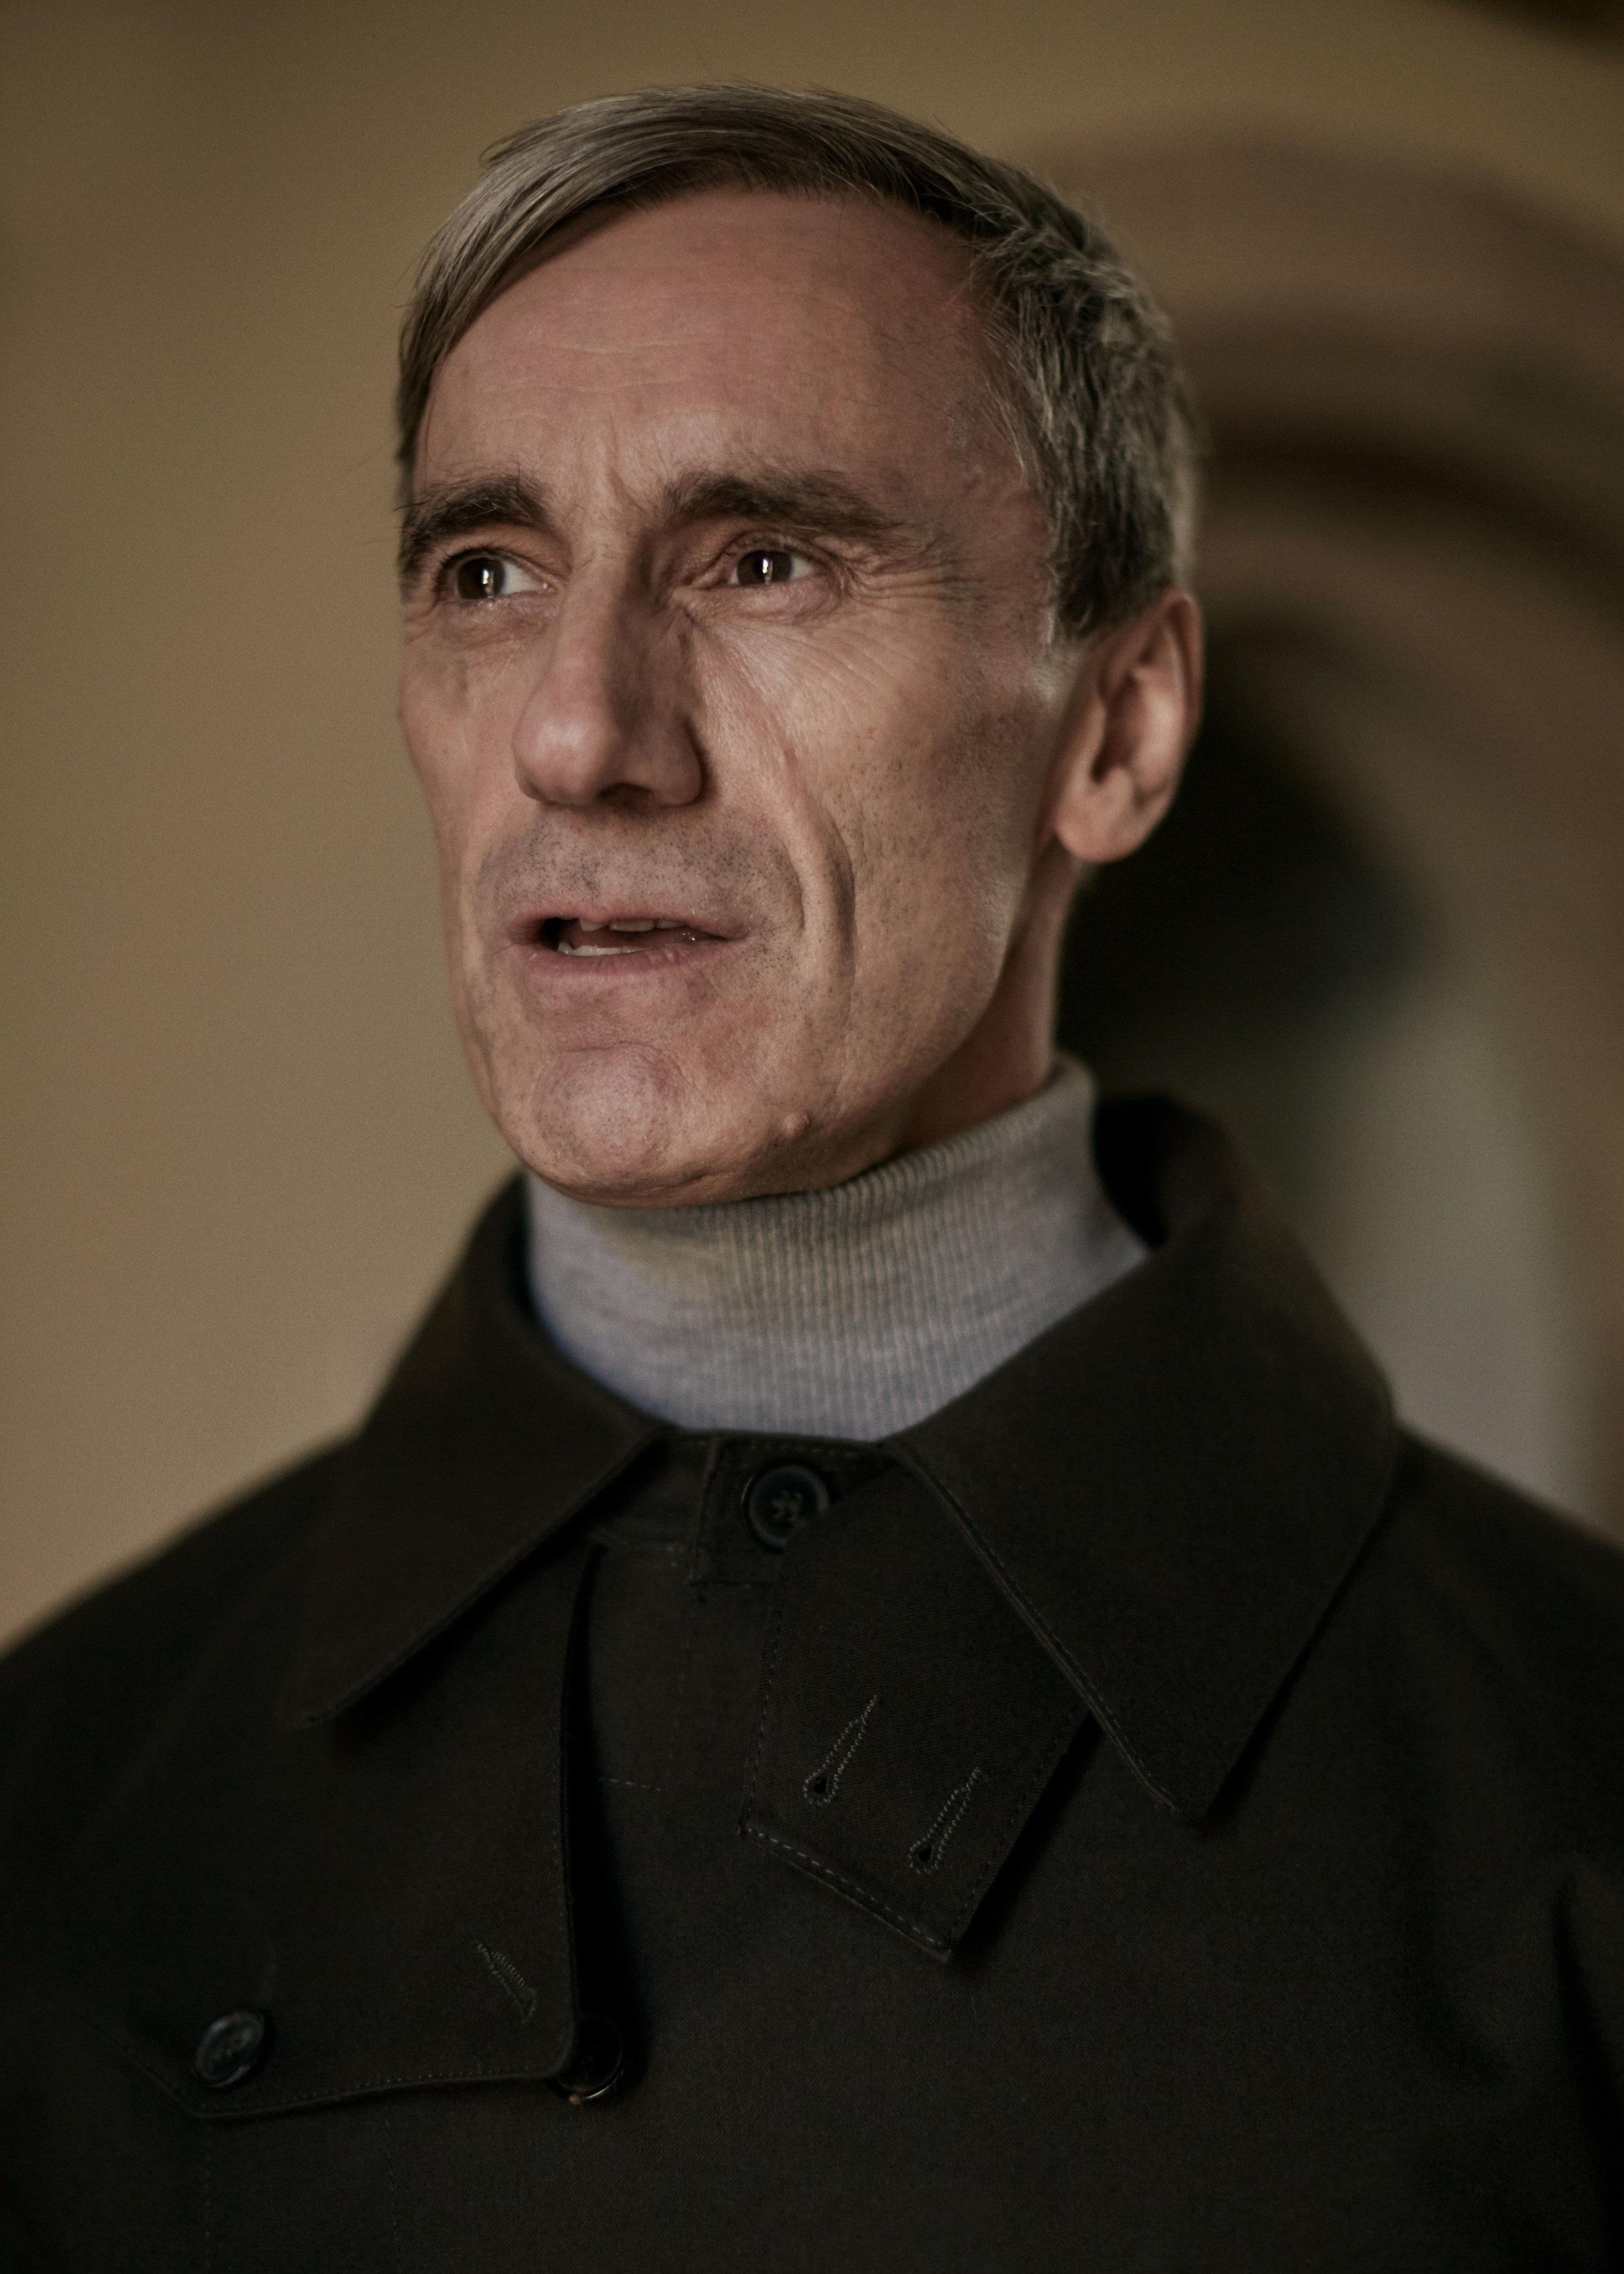 Bonded-cotton belted coat MACKINTOSH,grey wool turtleneck sweater ZARA.